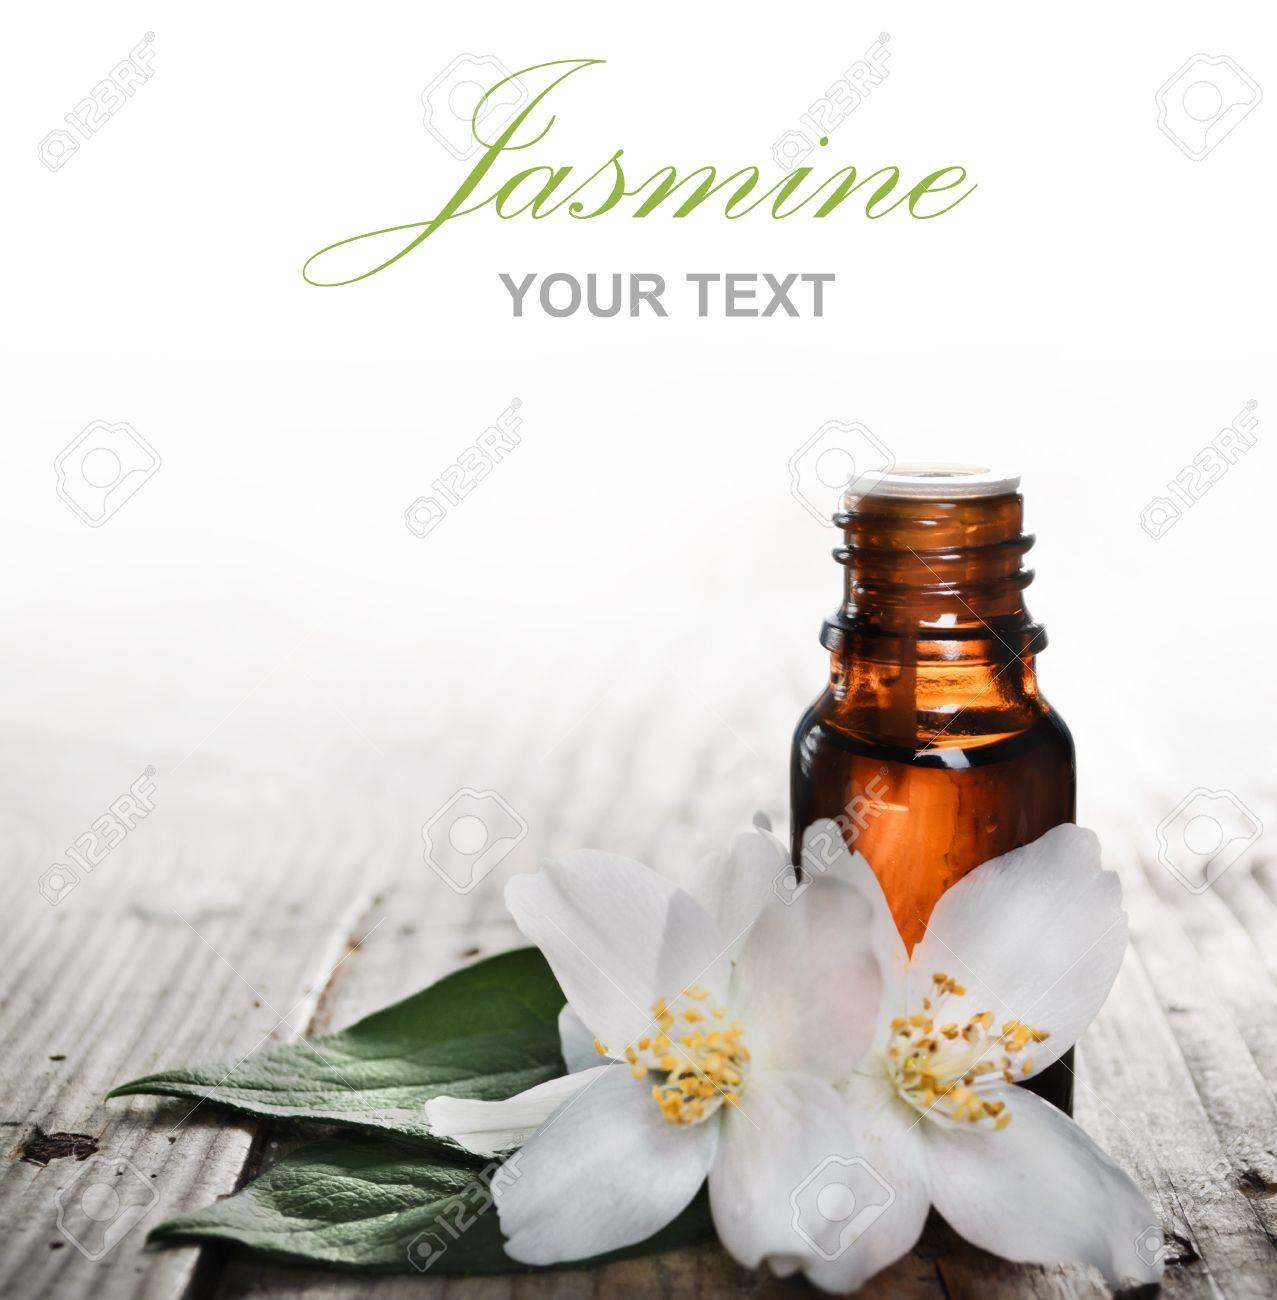 Essential oil with jasmine flower on wooden plank - 16839675